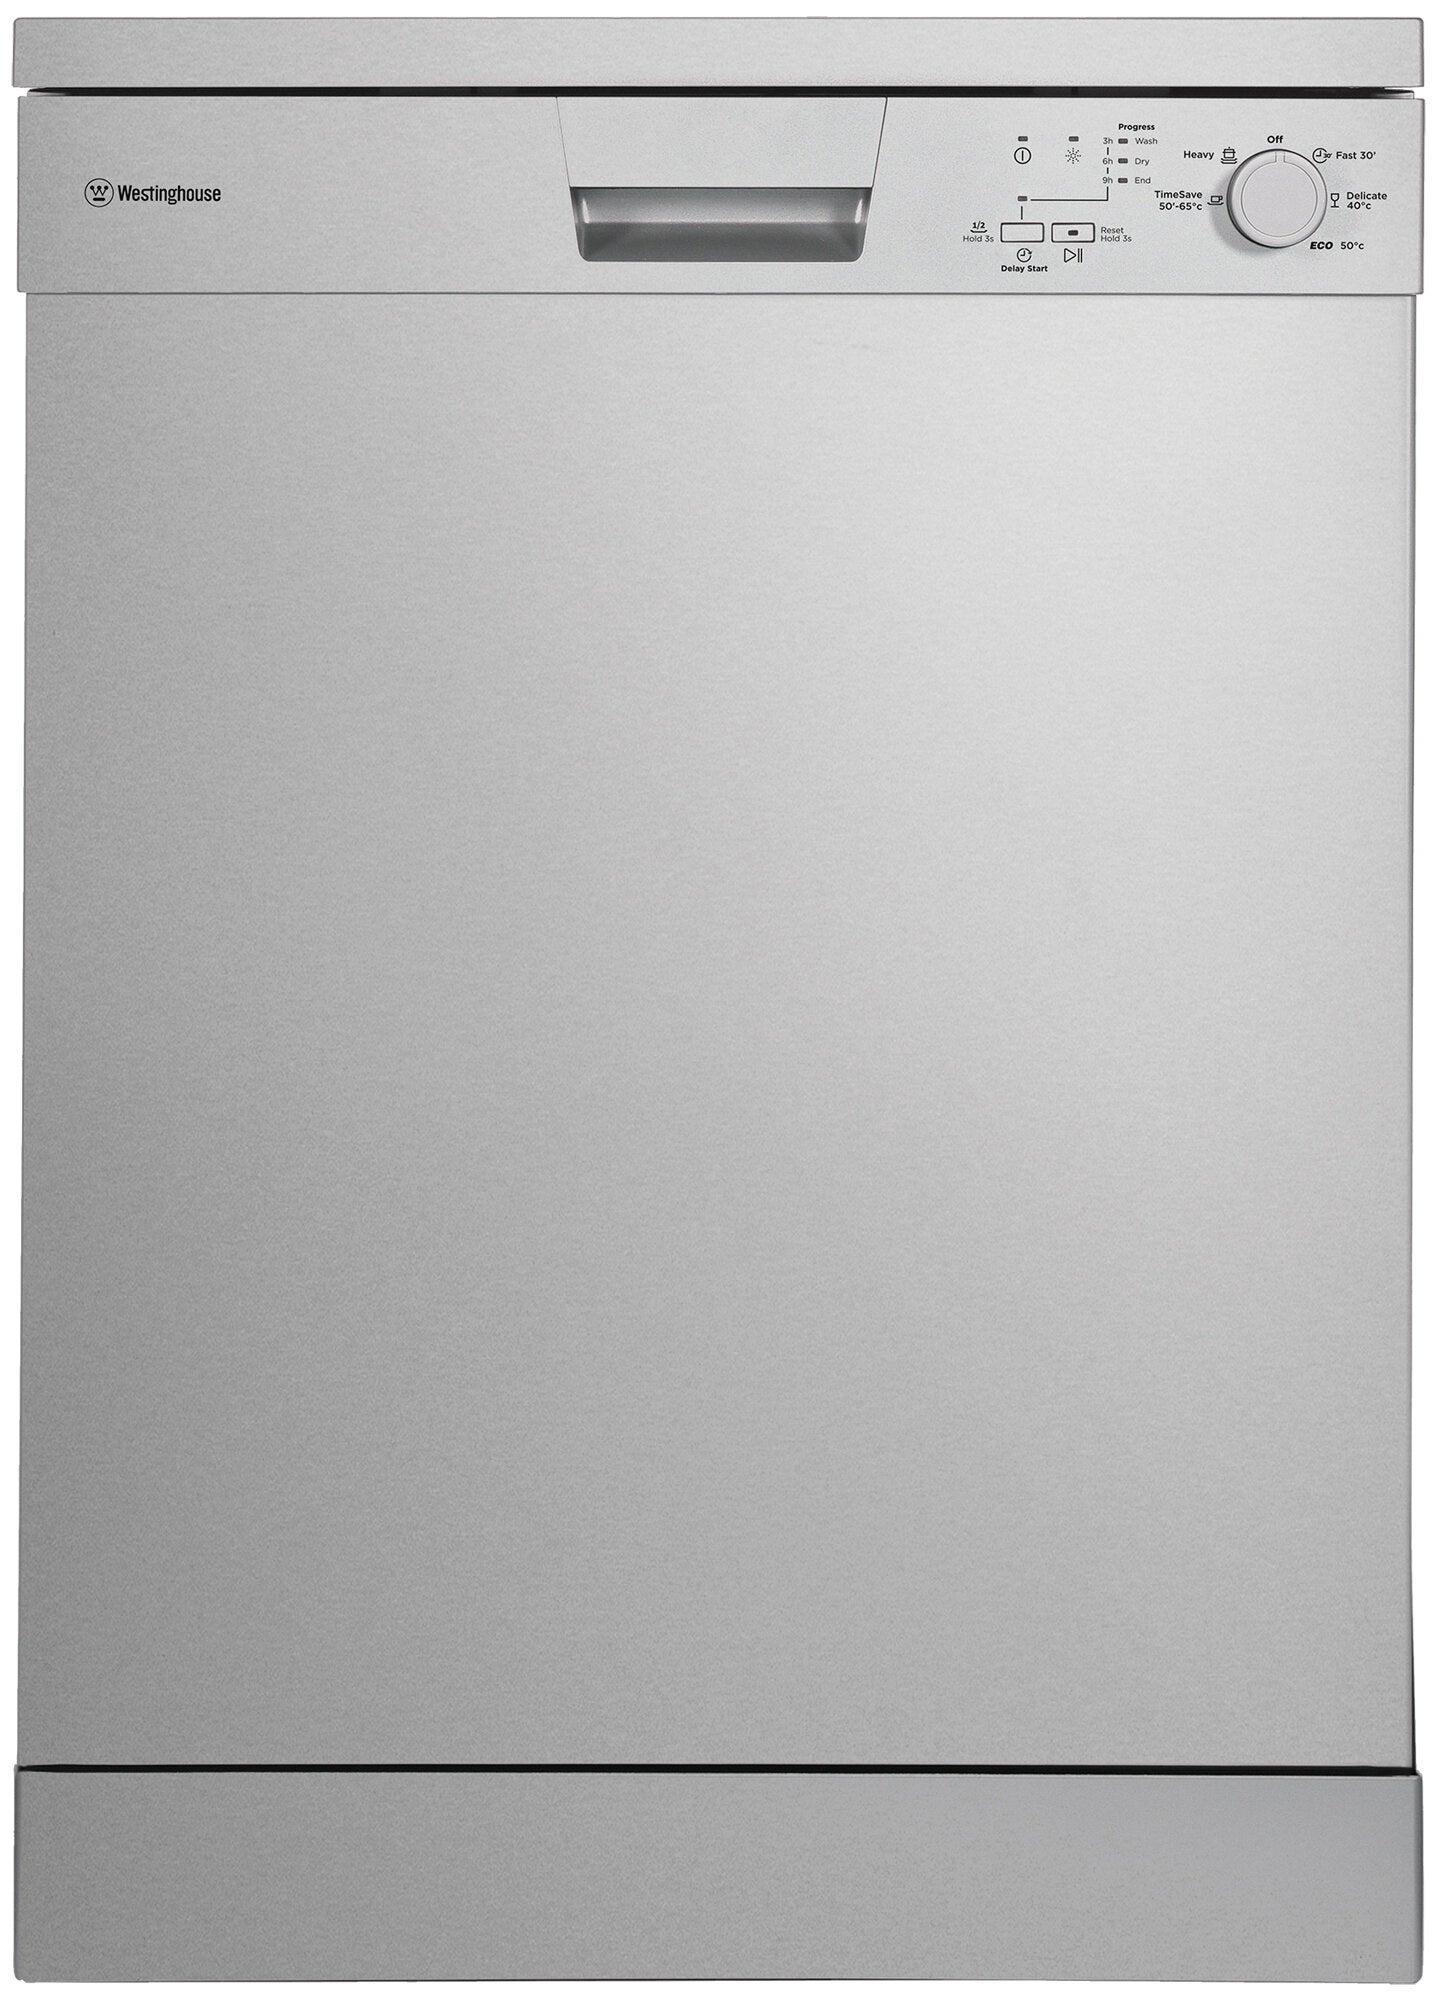 Westinghouse WSF6602XA Dishwasher